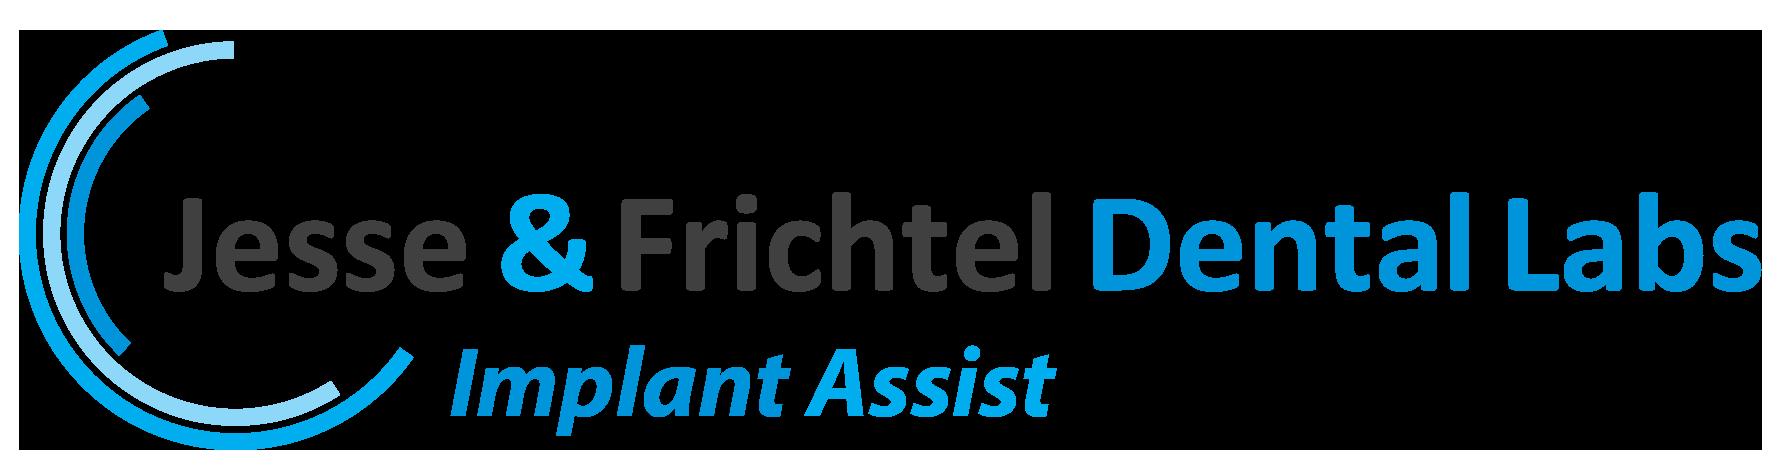 Implant Assist by Jesse & Frichtel Dental Labs